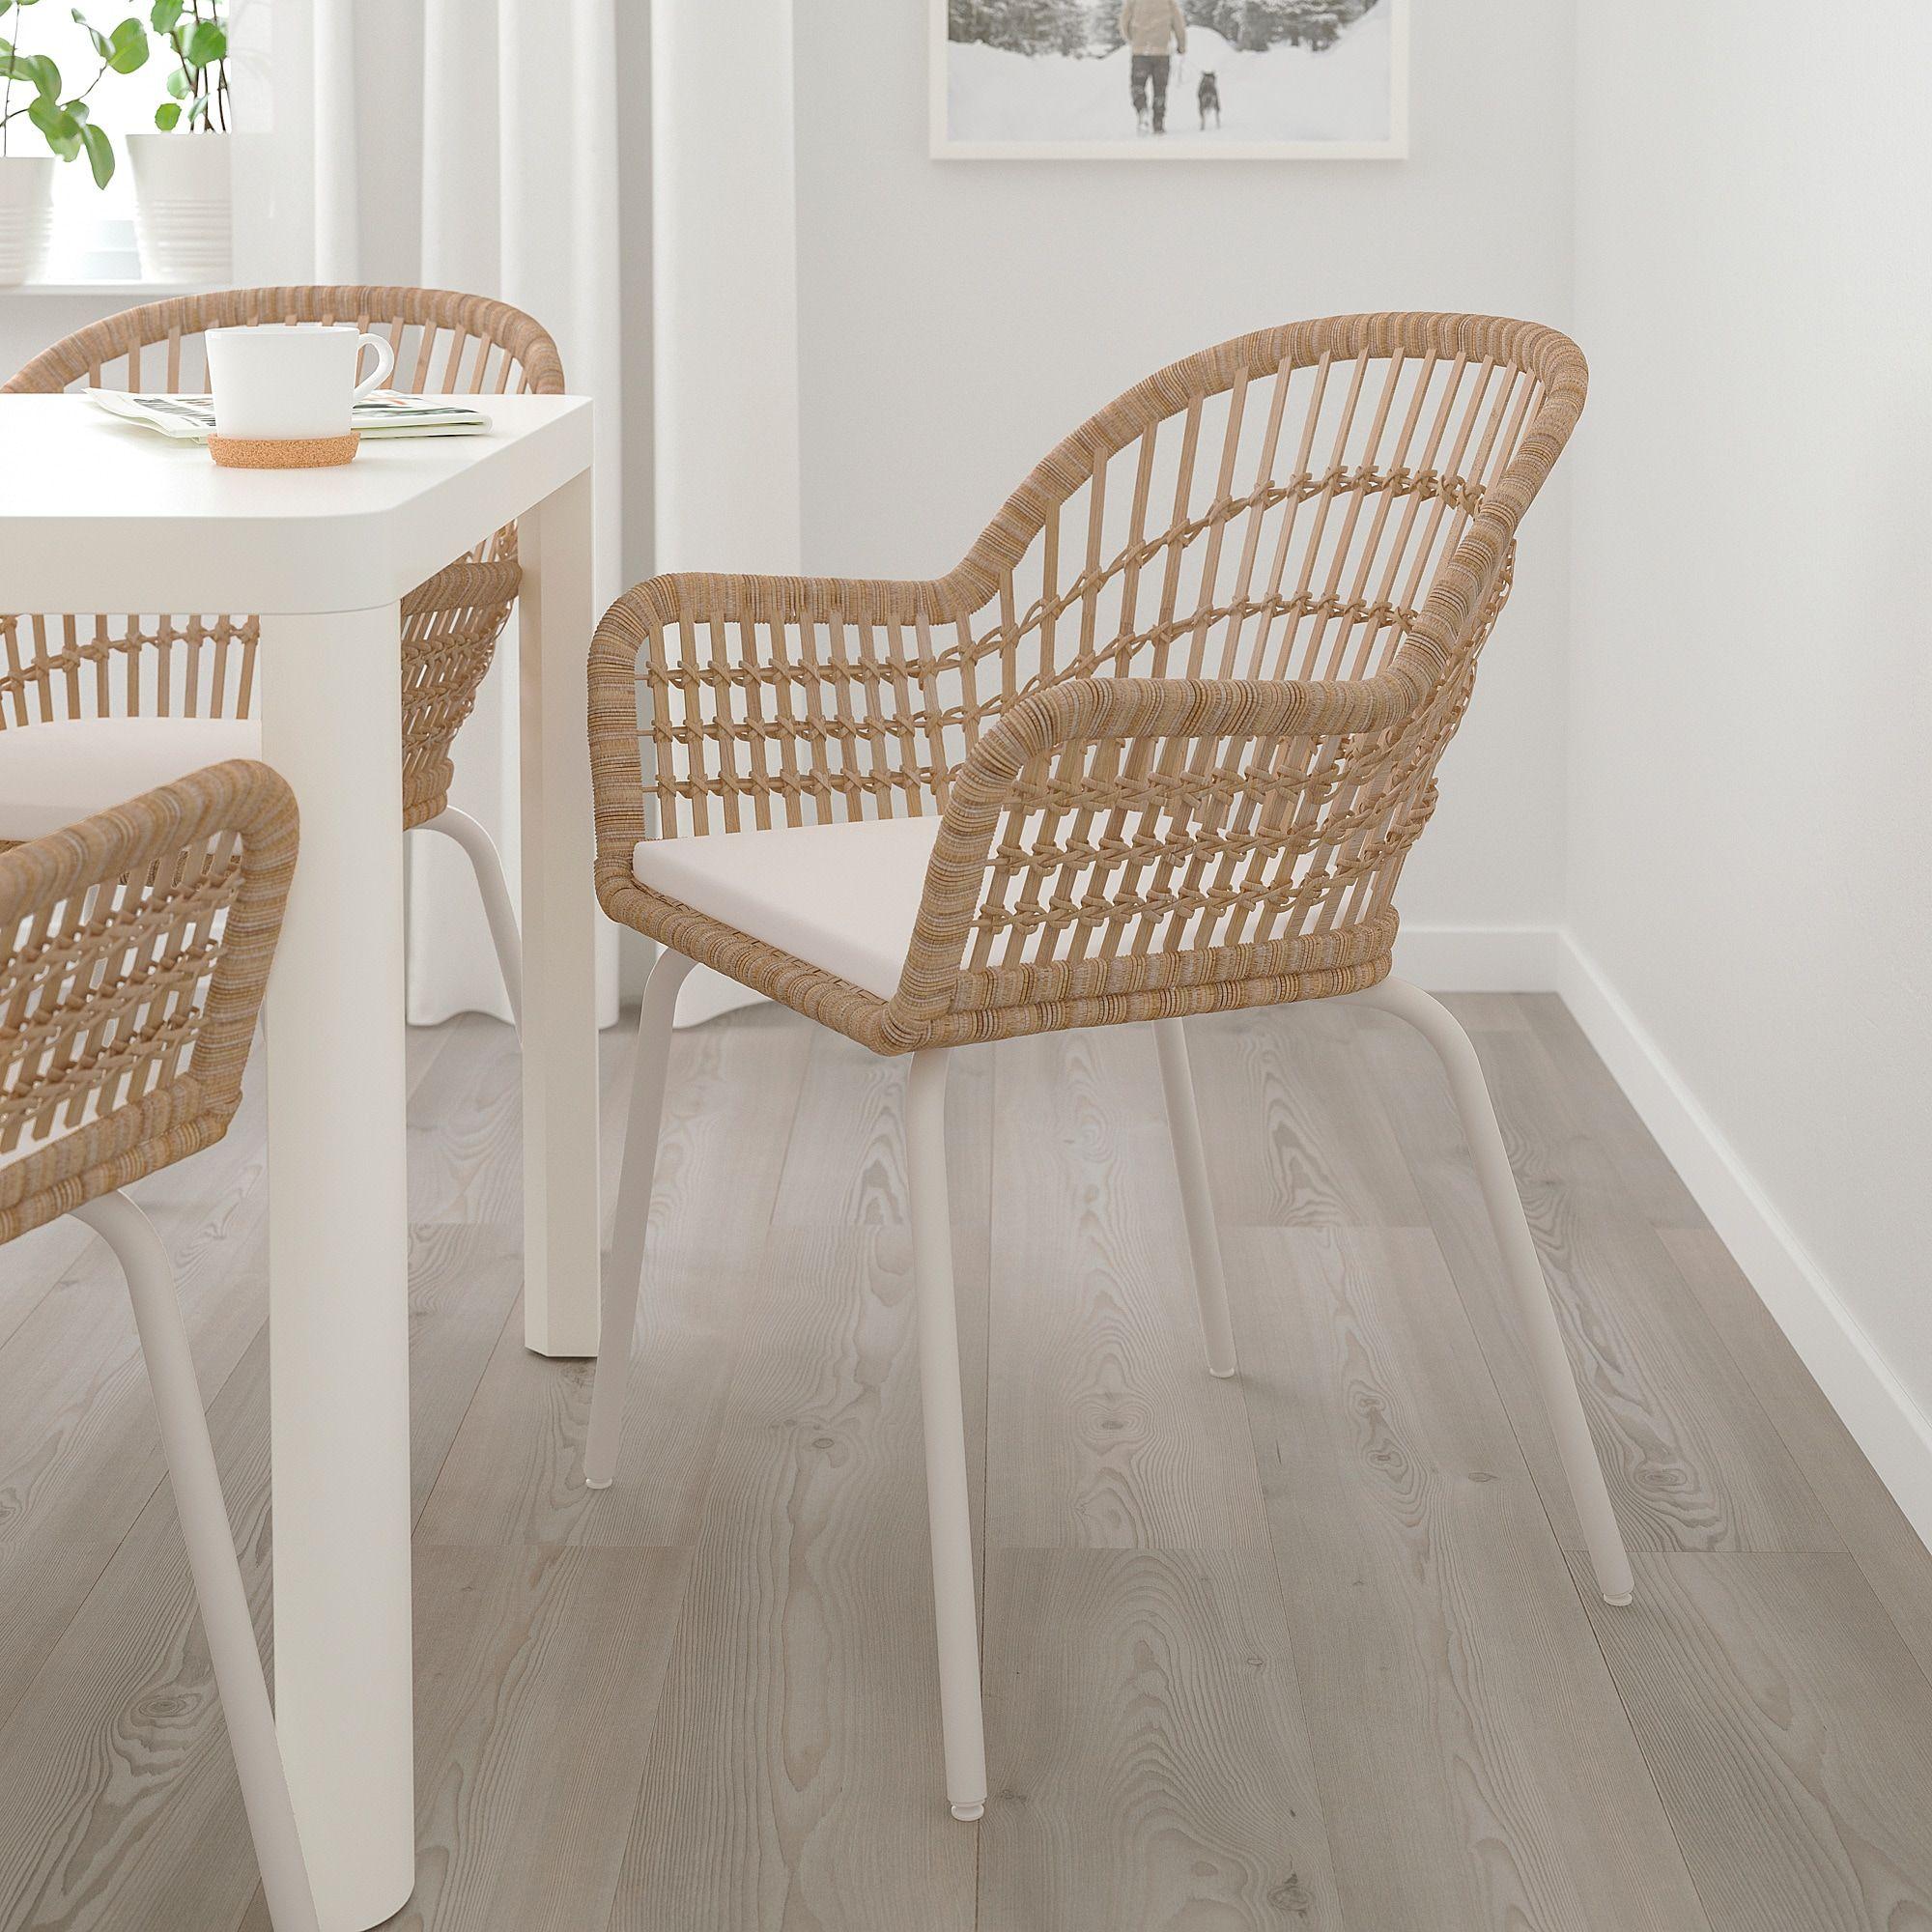 IKEA NILSOVE / NORNA Chair with chair pad Rattan